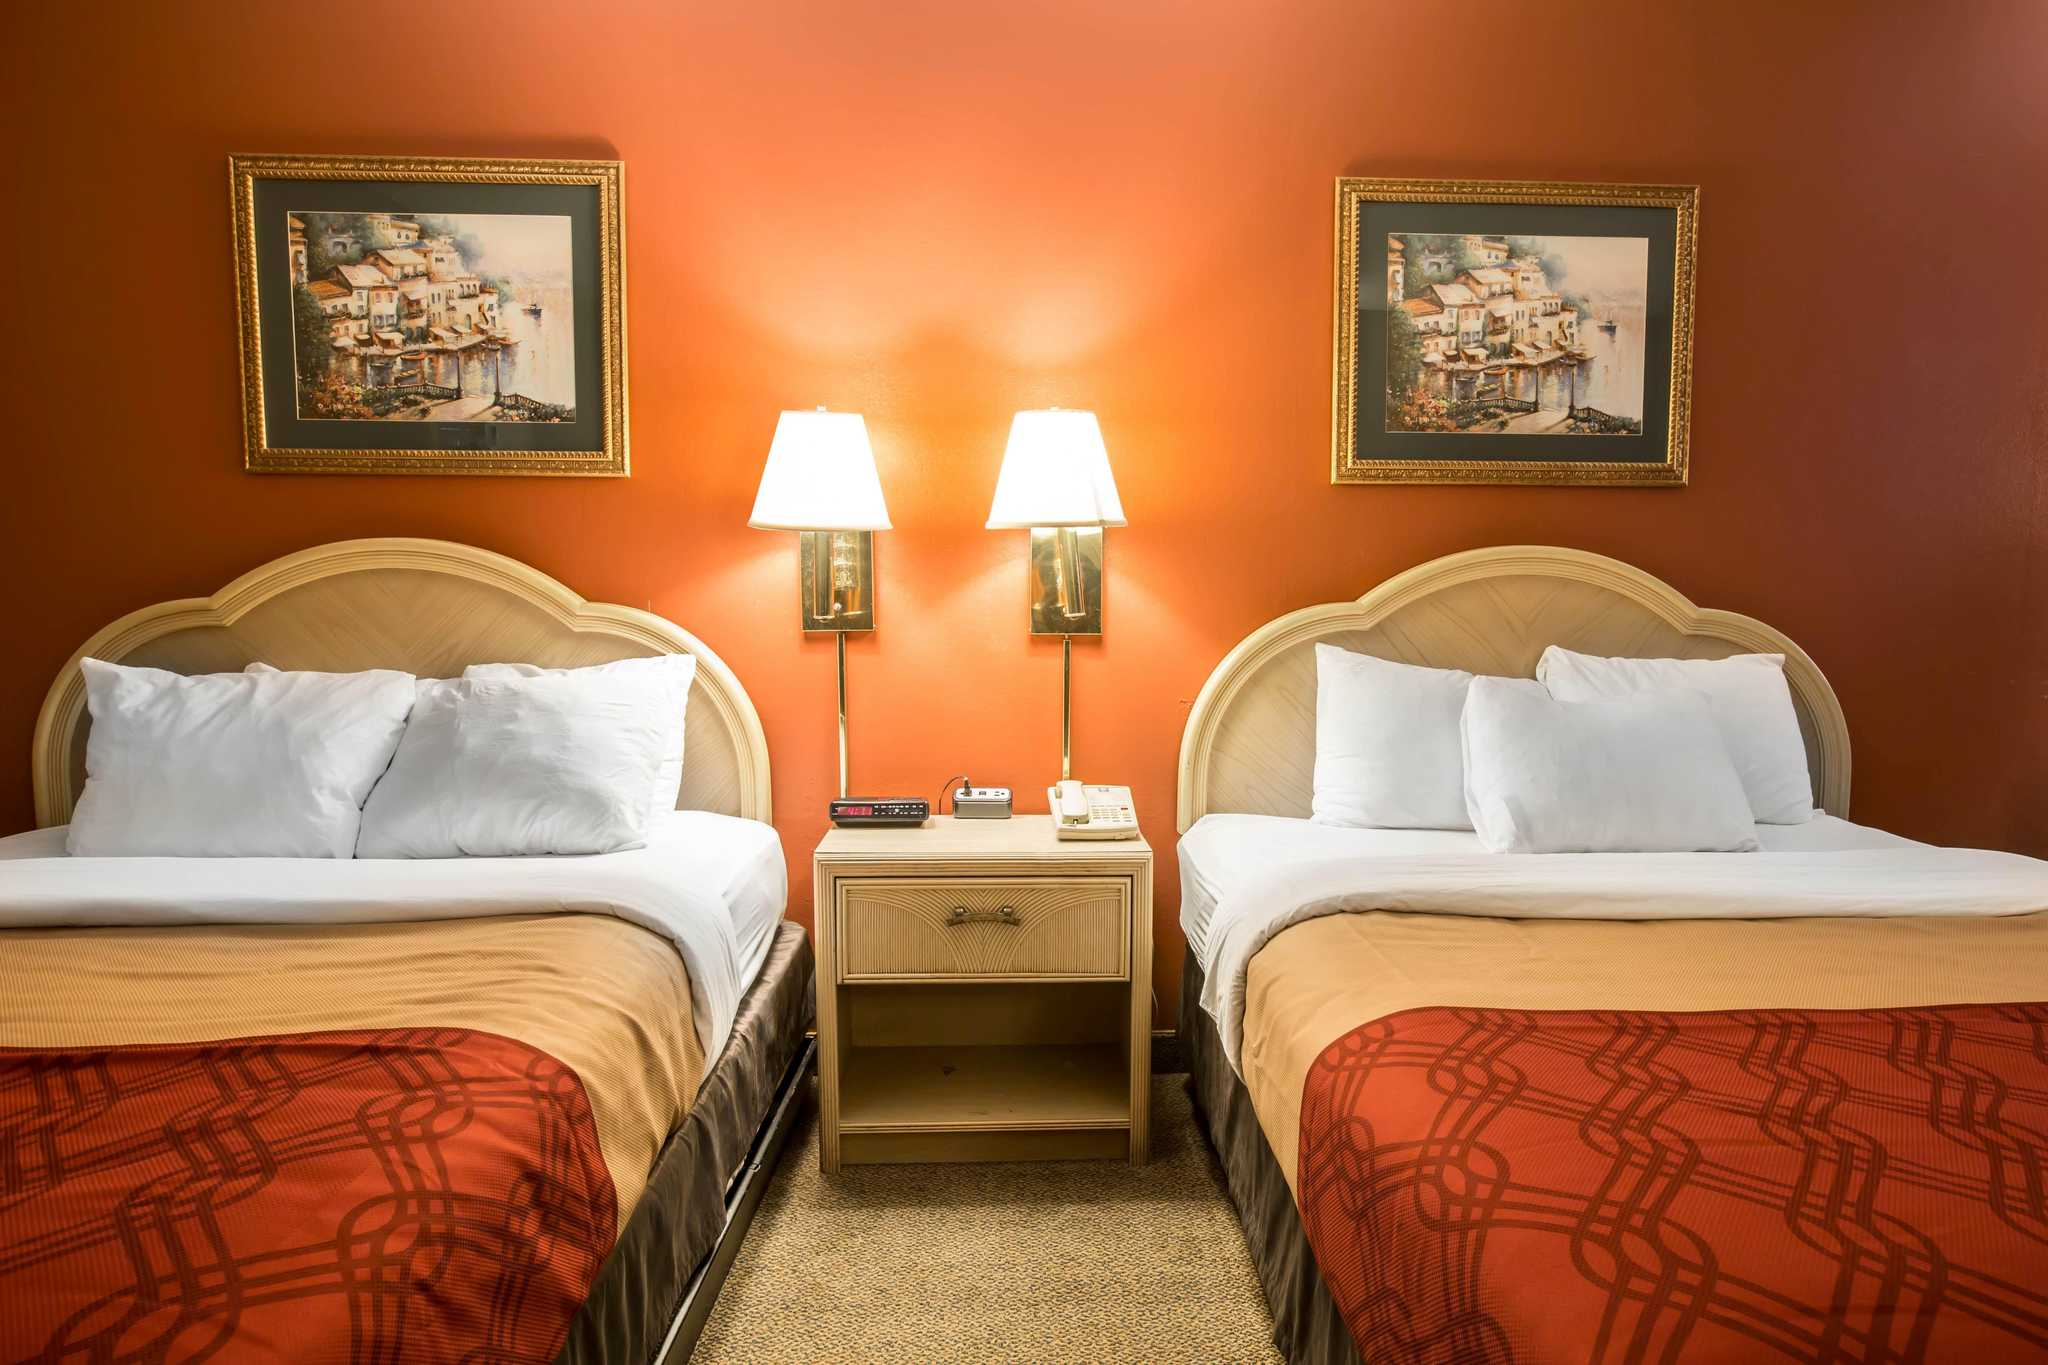 Econo Lodge image 8